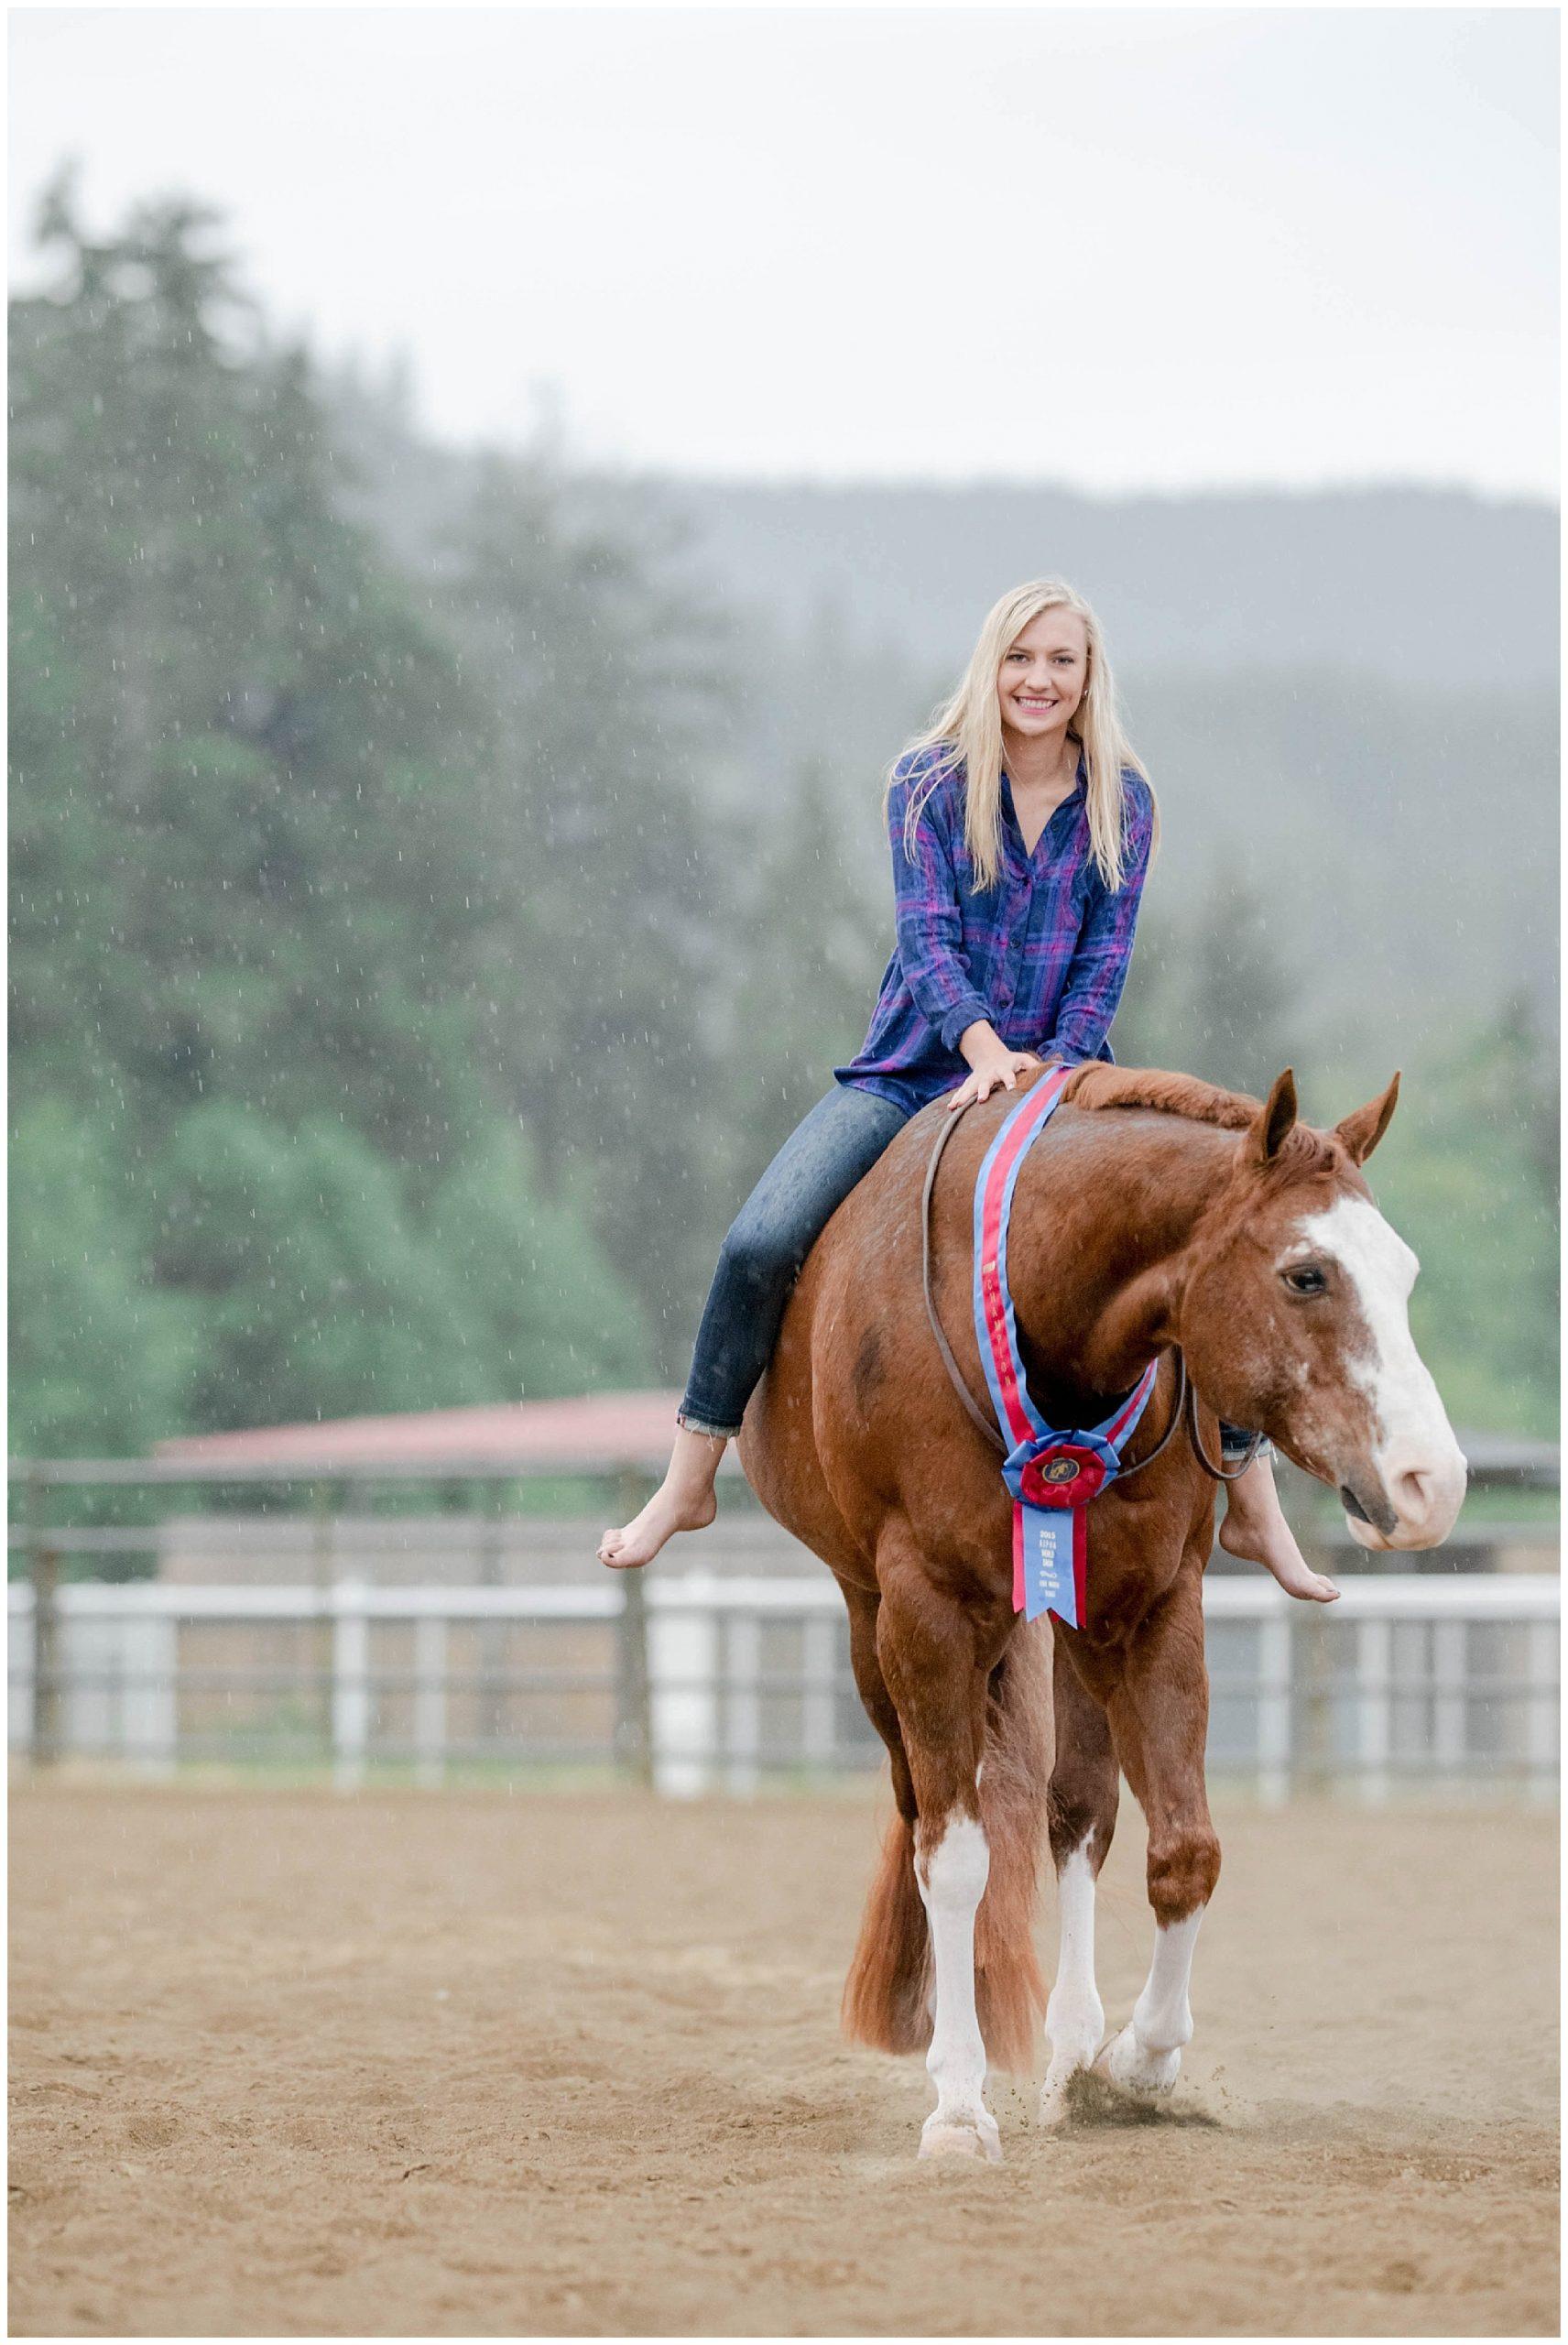 https://kirstiemarie.com/wp-content/uploads/2018/09/Mackenzie-Preston-Brokers-Lucky-Kid-AjPHA-World-Champion-Larson-Performance-Horses-Rhodes-River-Ranch-Kirstie-Marie-Photography_0018-1-scaled.jpg